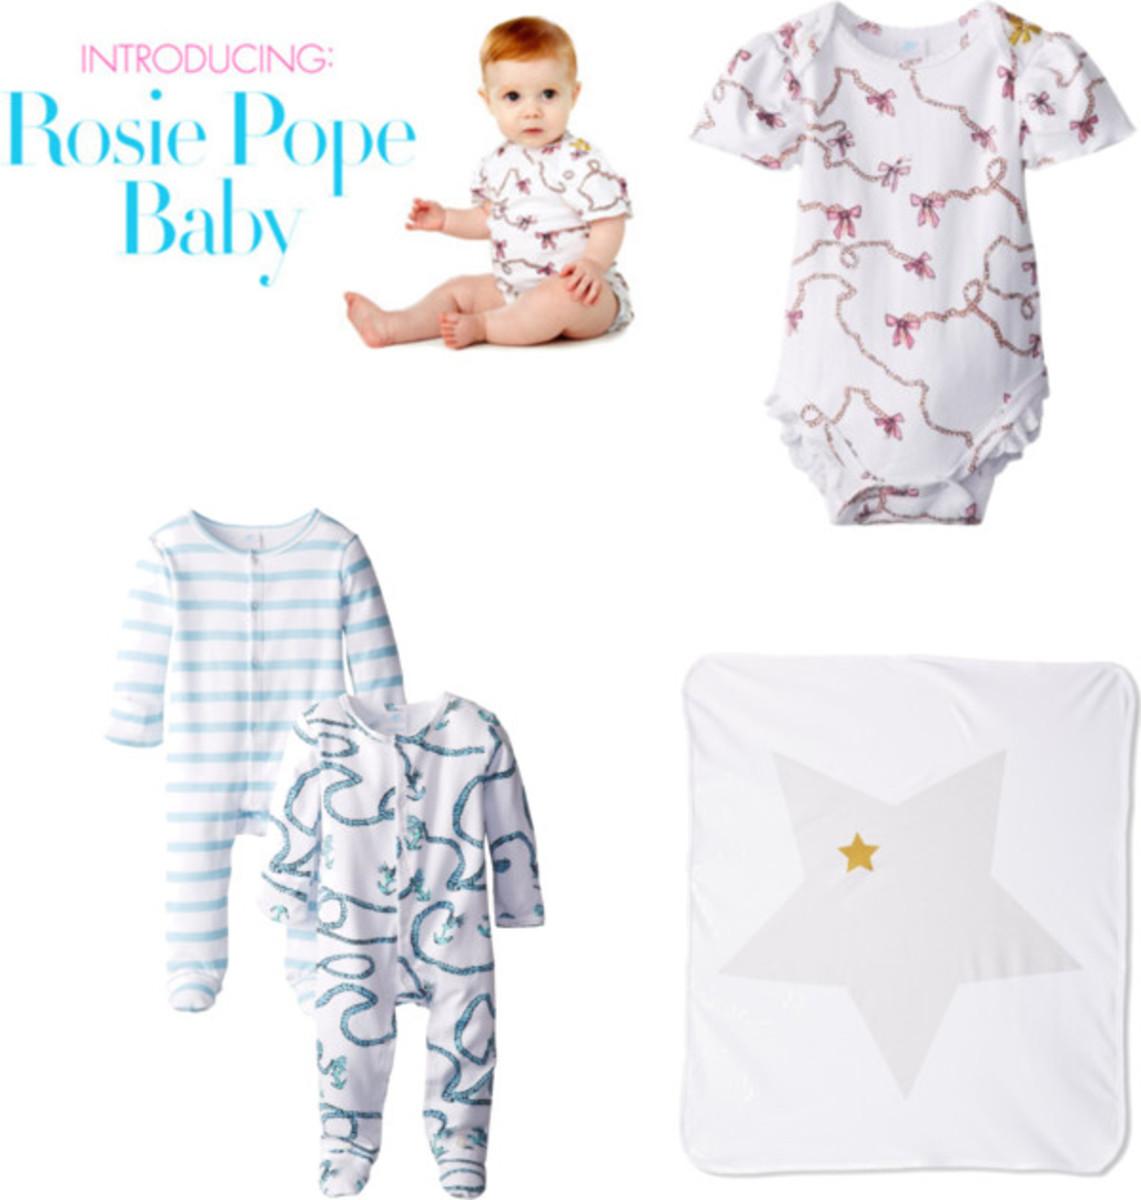 rosie pope baby